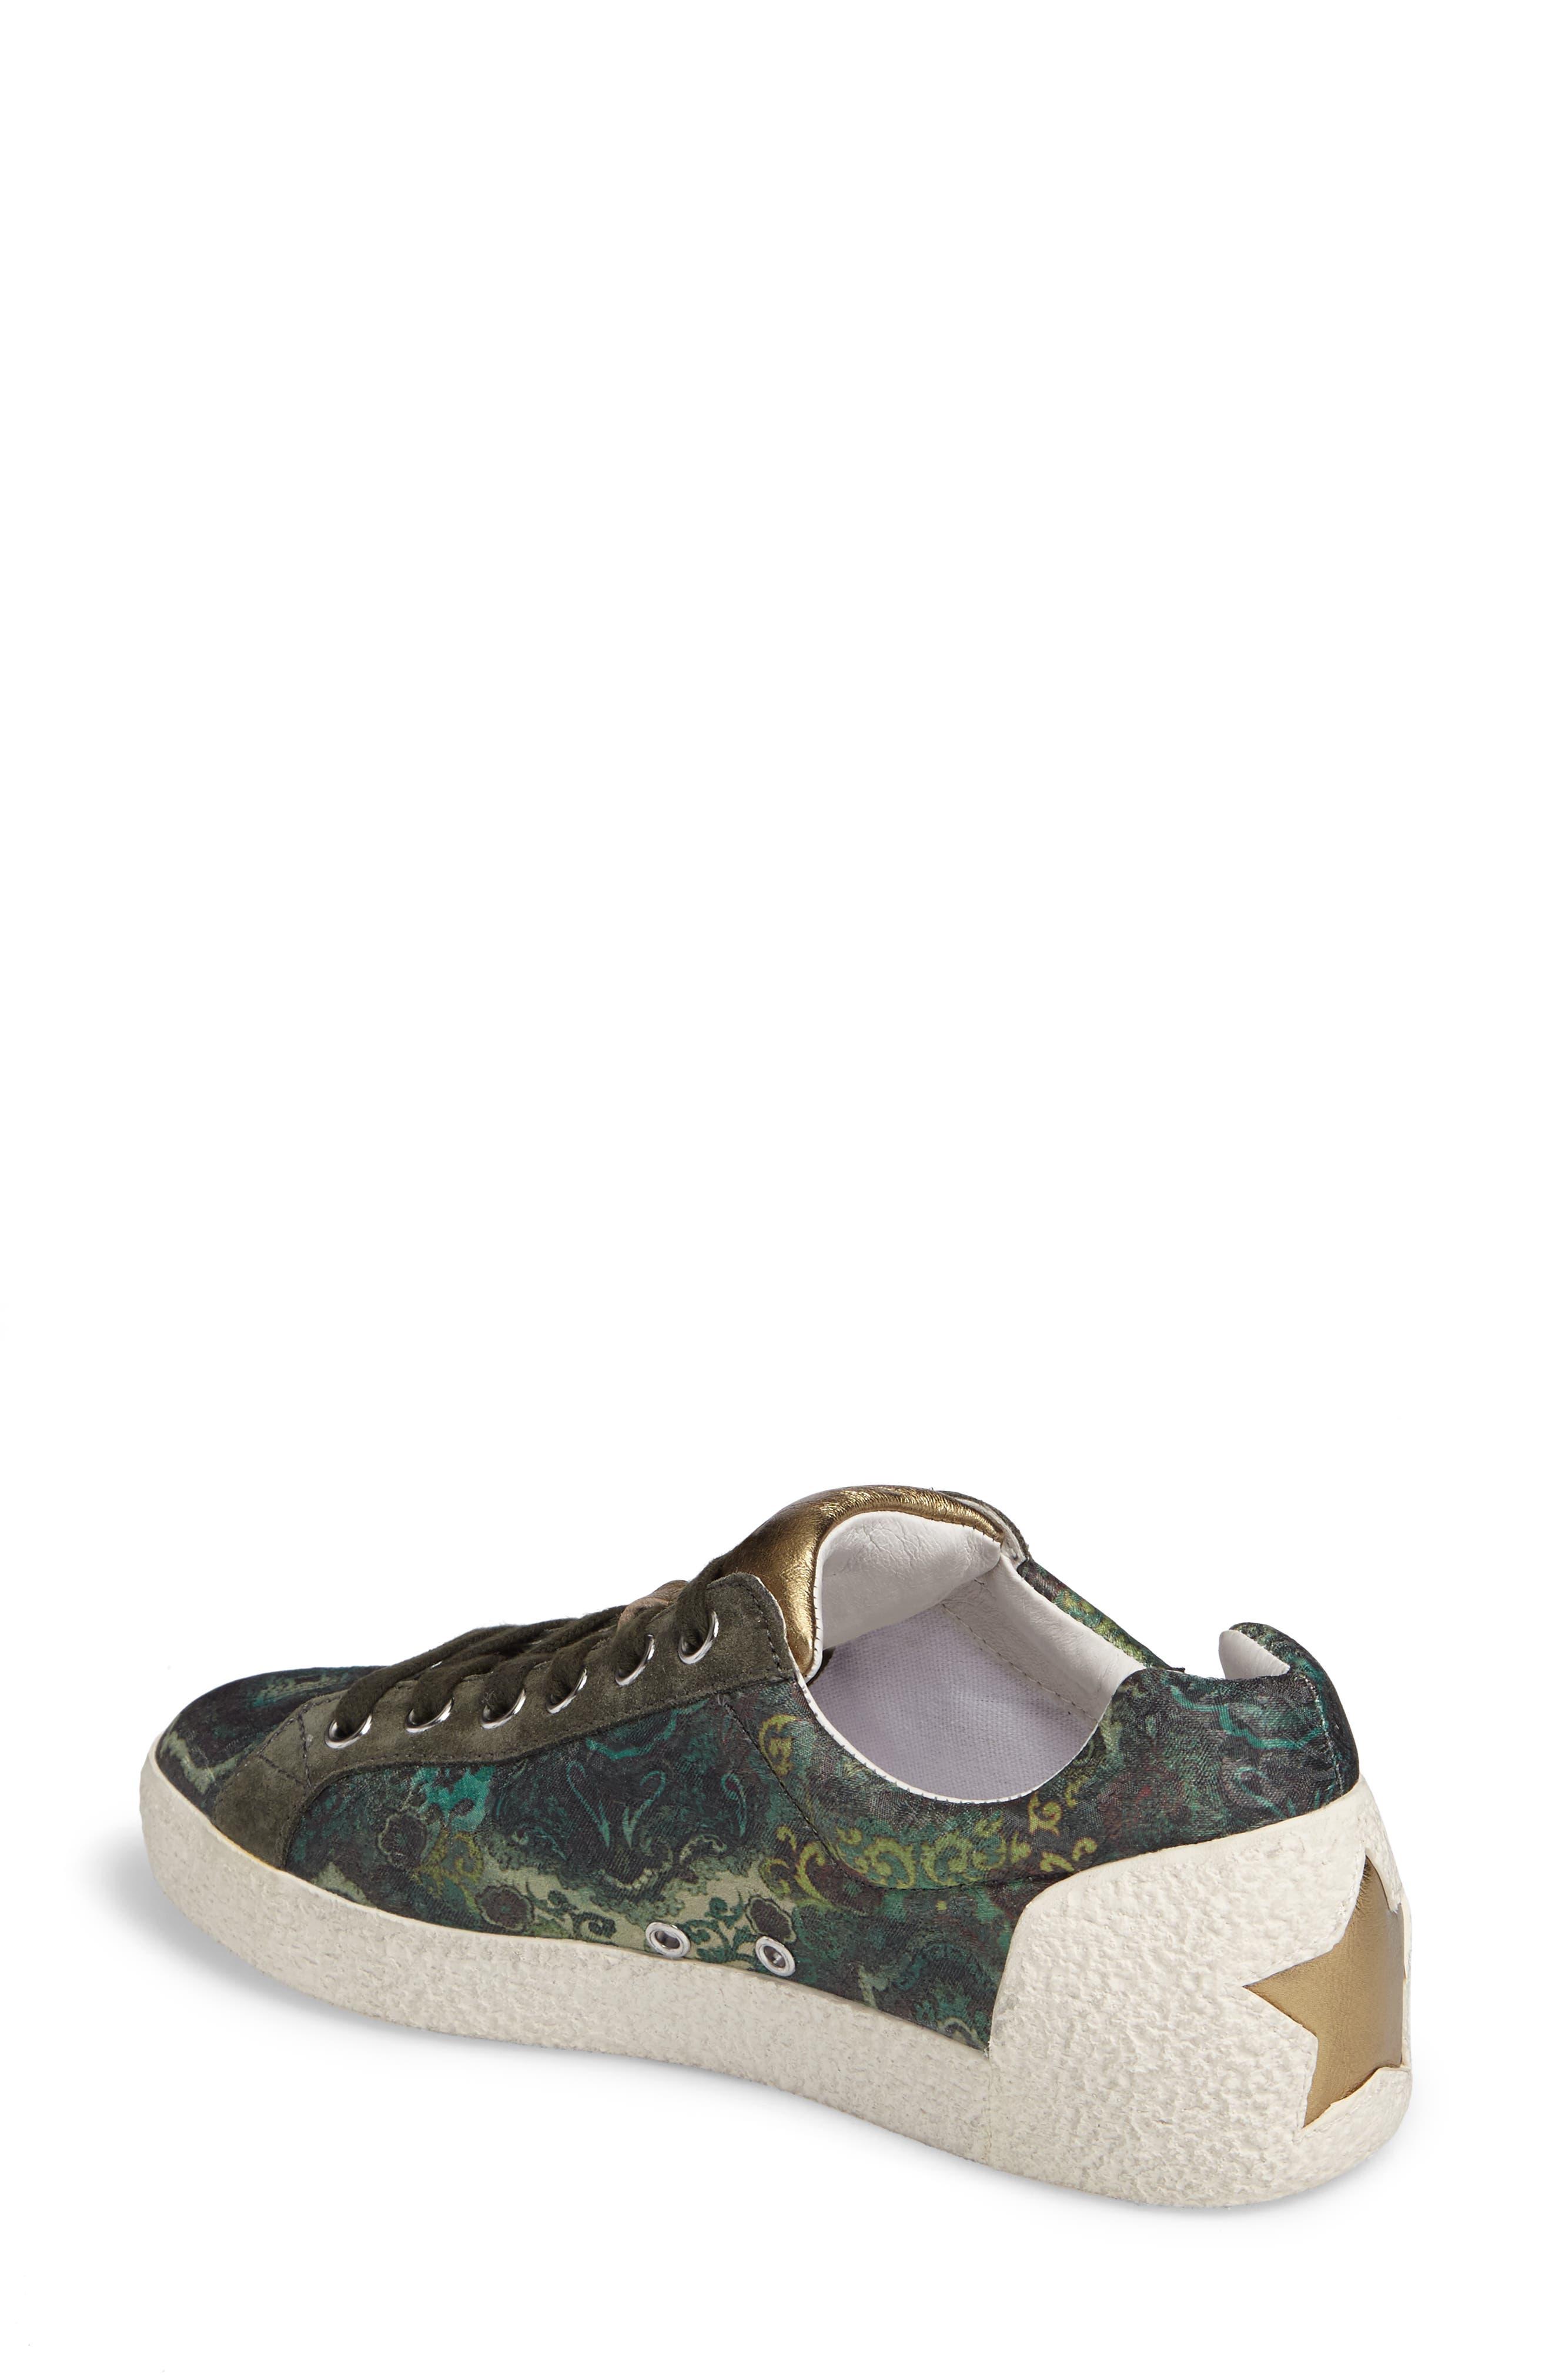 Embellished Low-Top Sneaker,                             Alternate thumbnail 2, color,